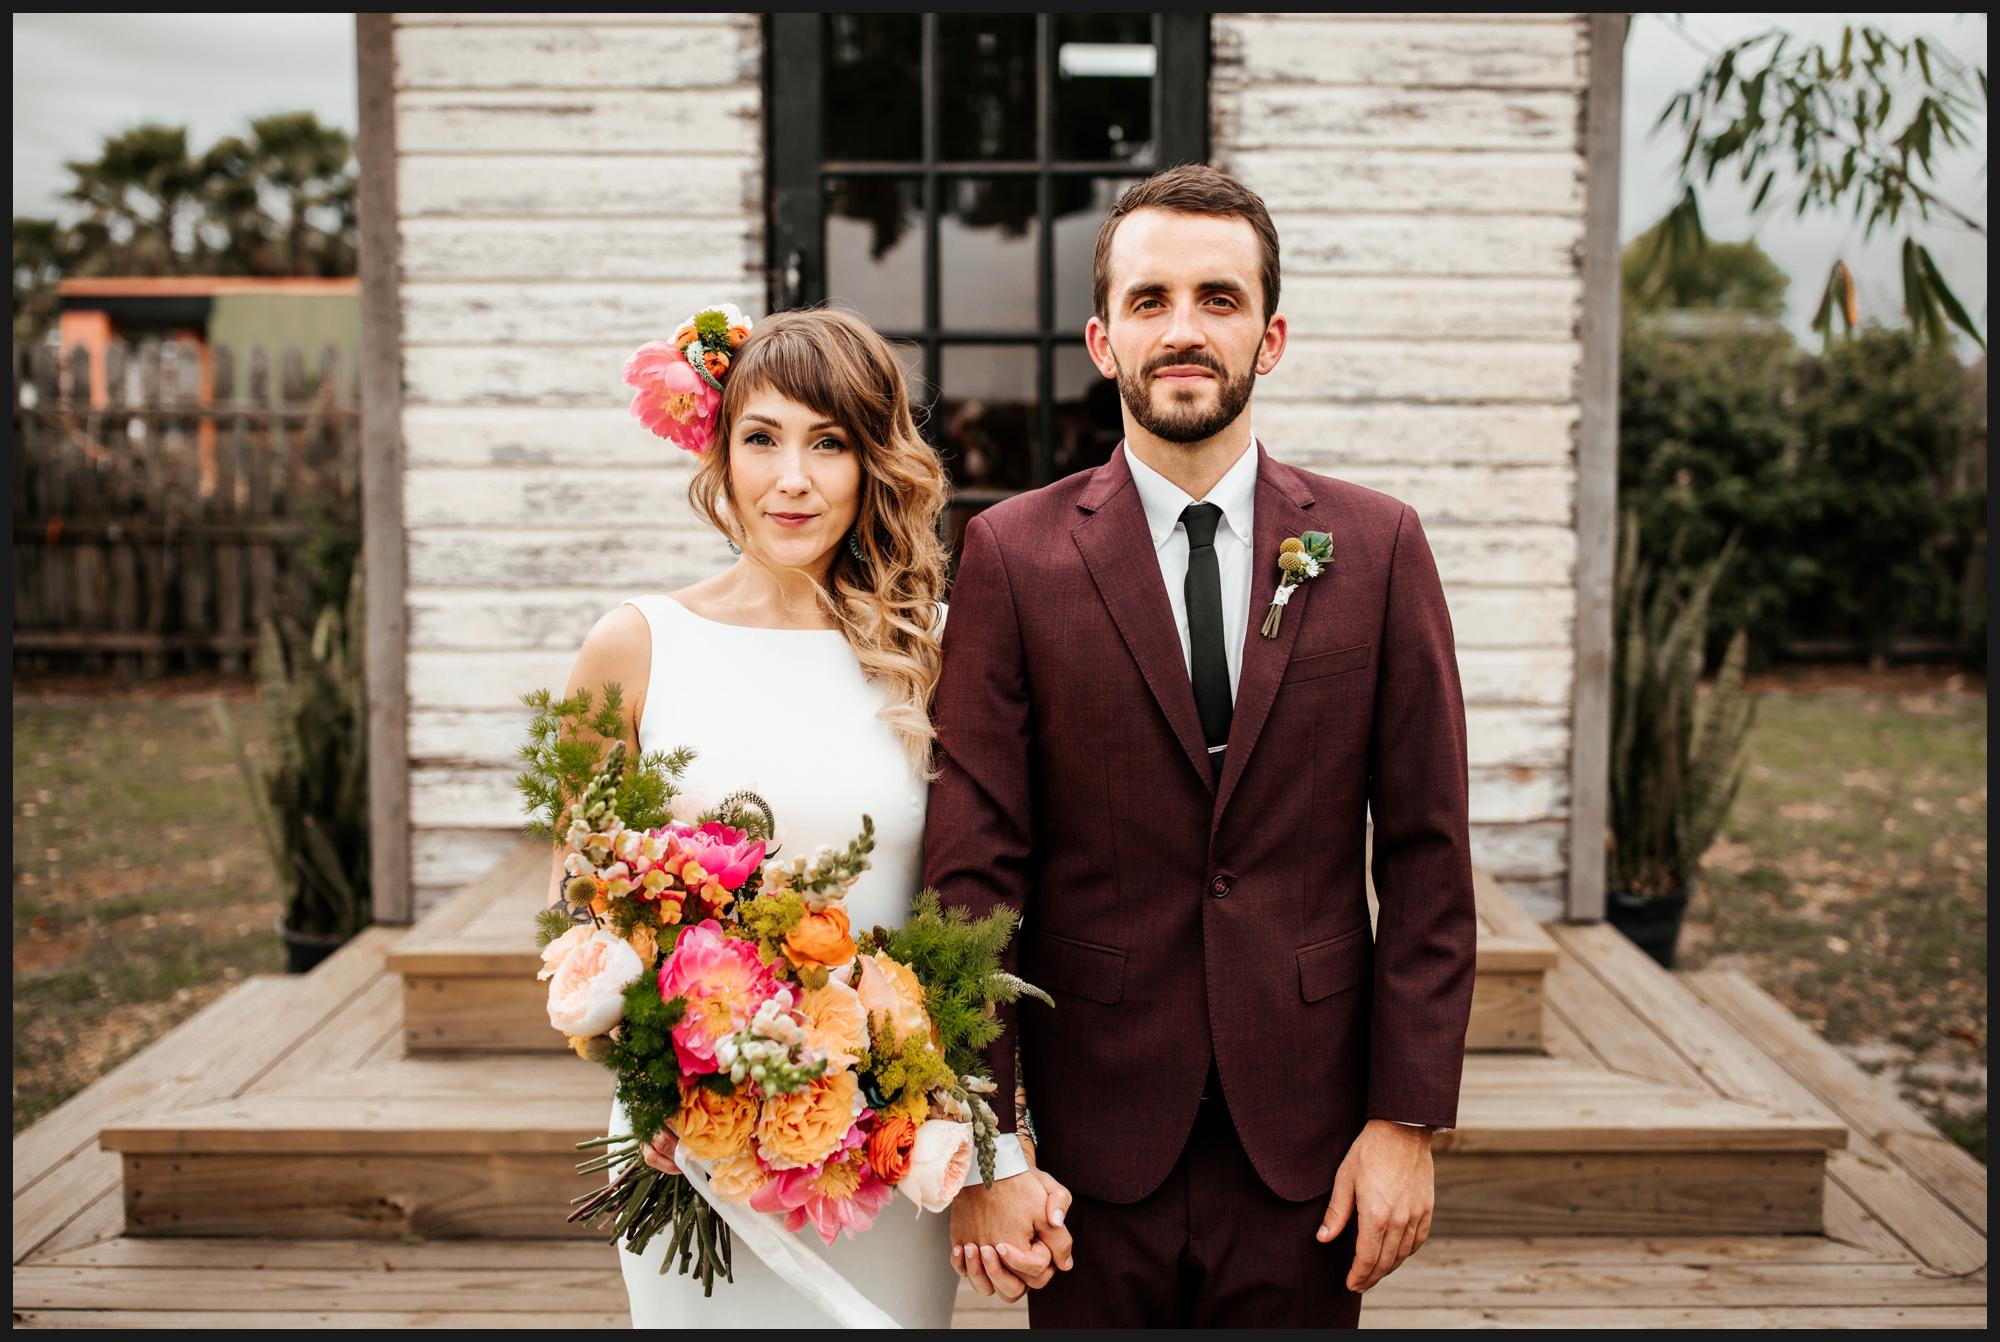 Orlando-Wedding-Photographer-destination-wedding-photographer-florida-wedding-photographer-bohemian-wedding-photographer_1994.jpg